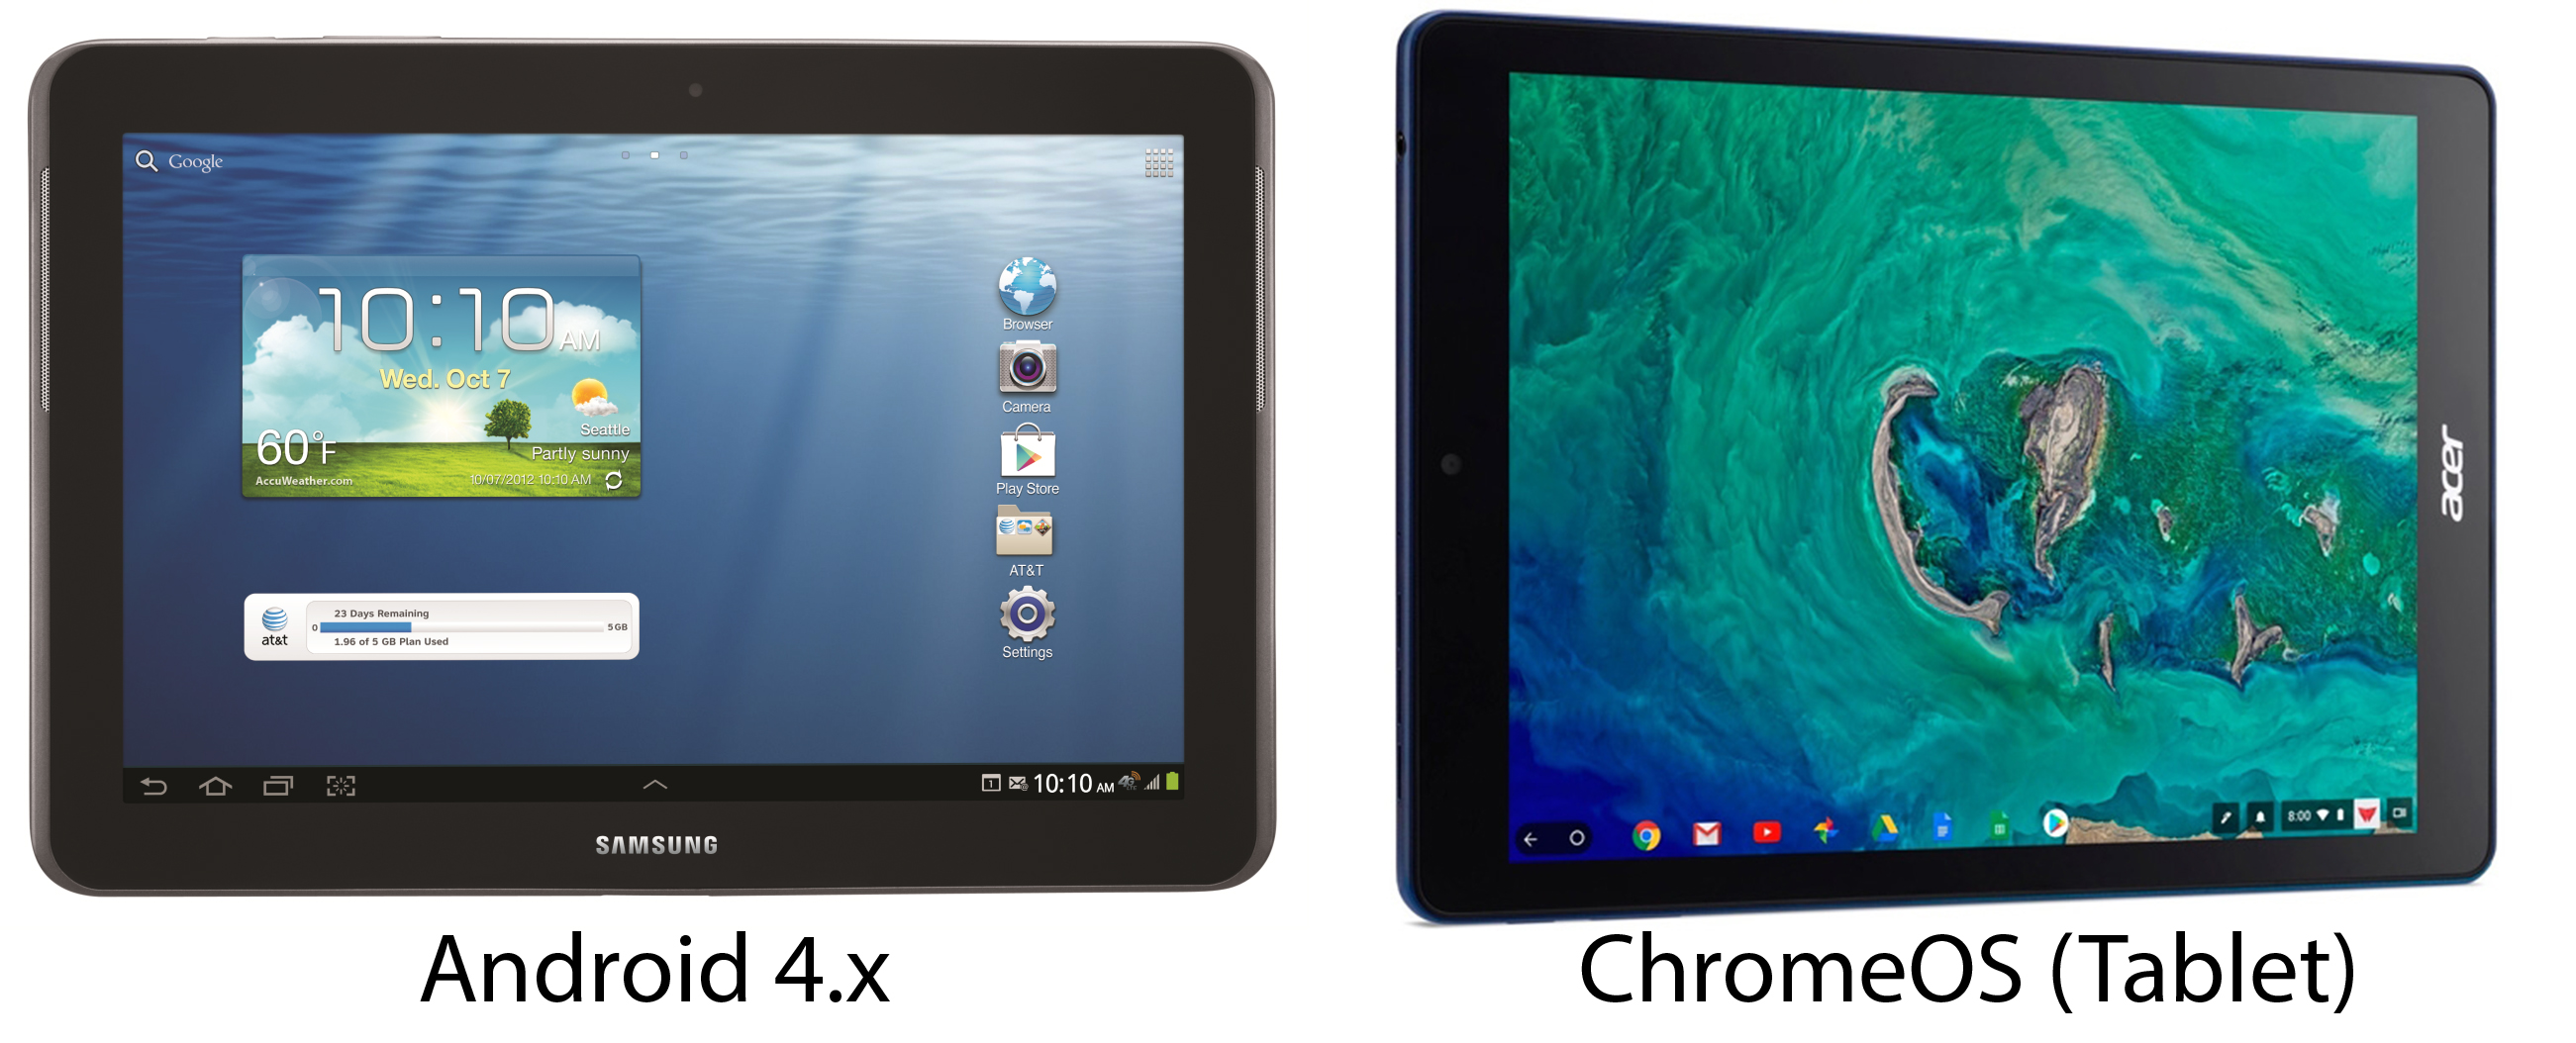 Первые характеристики и фото Samsung Galaxy Tab Advanced 2 и 2XL